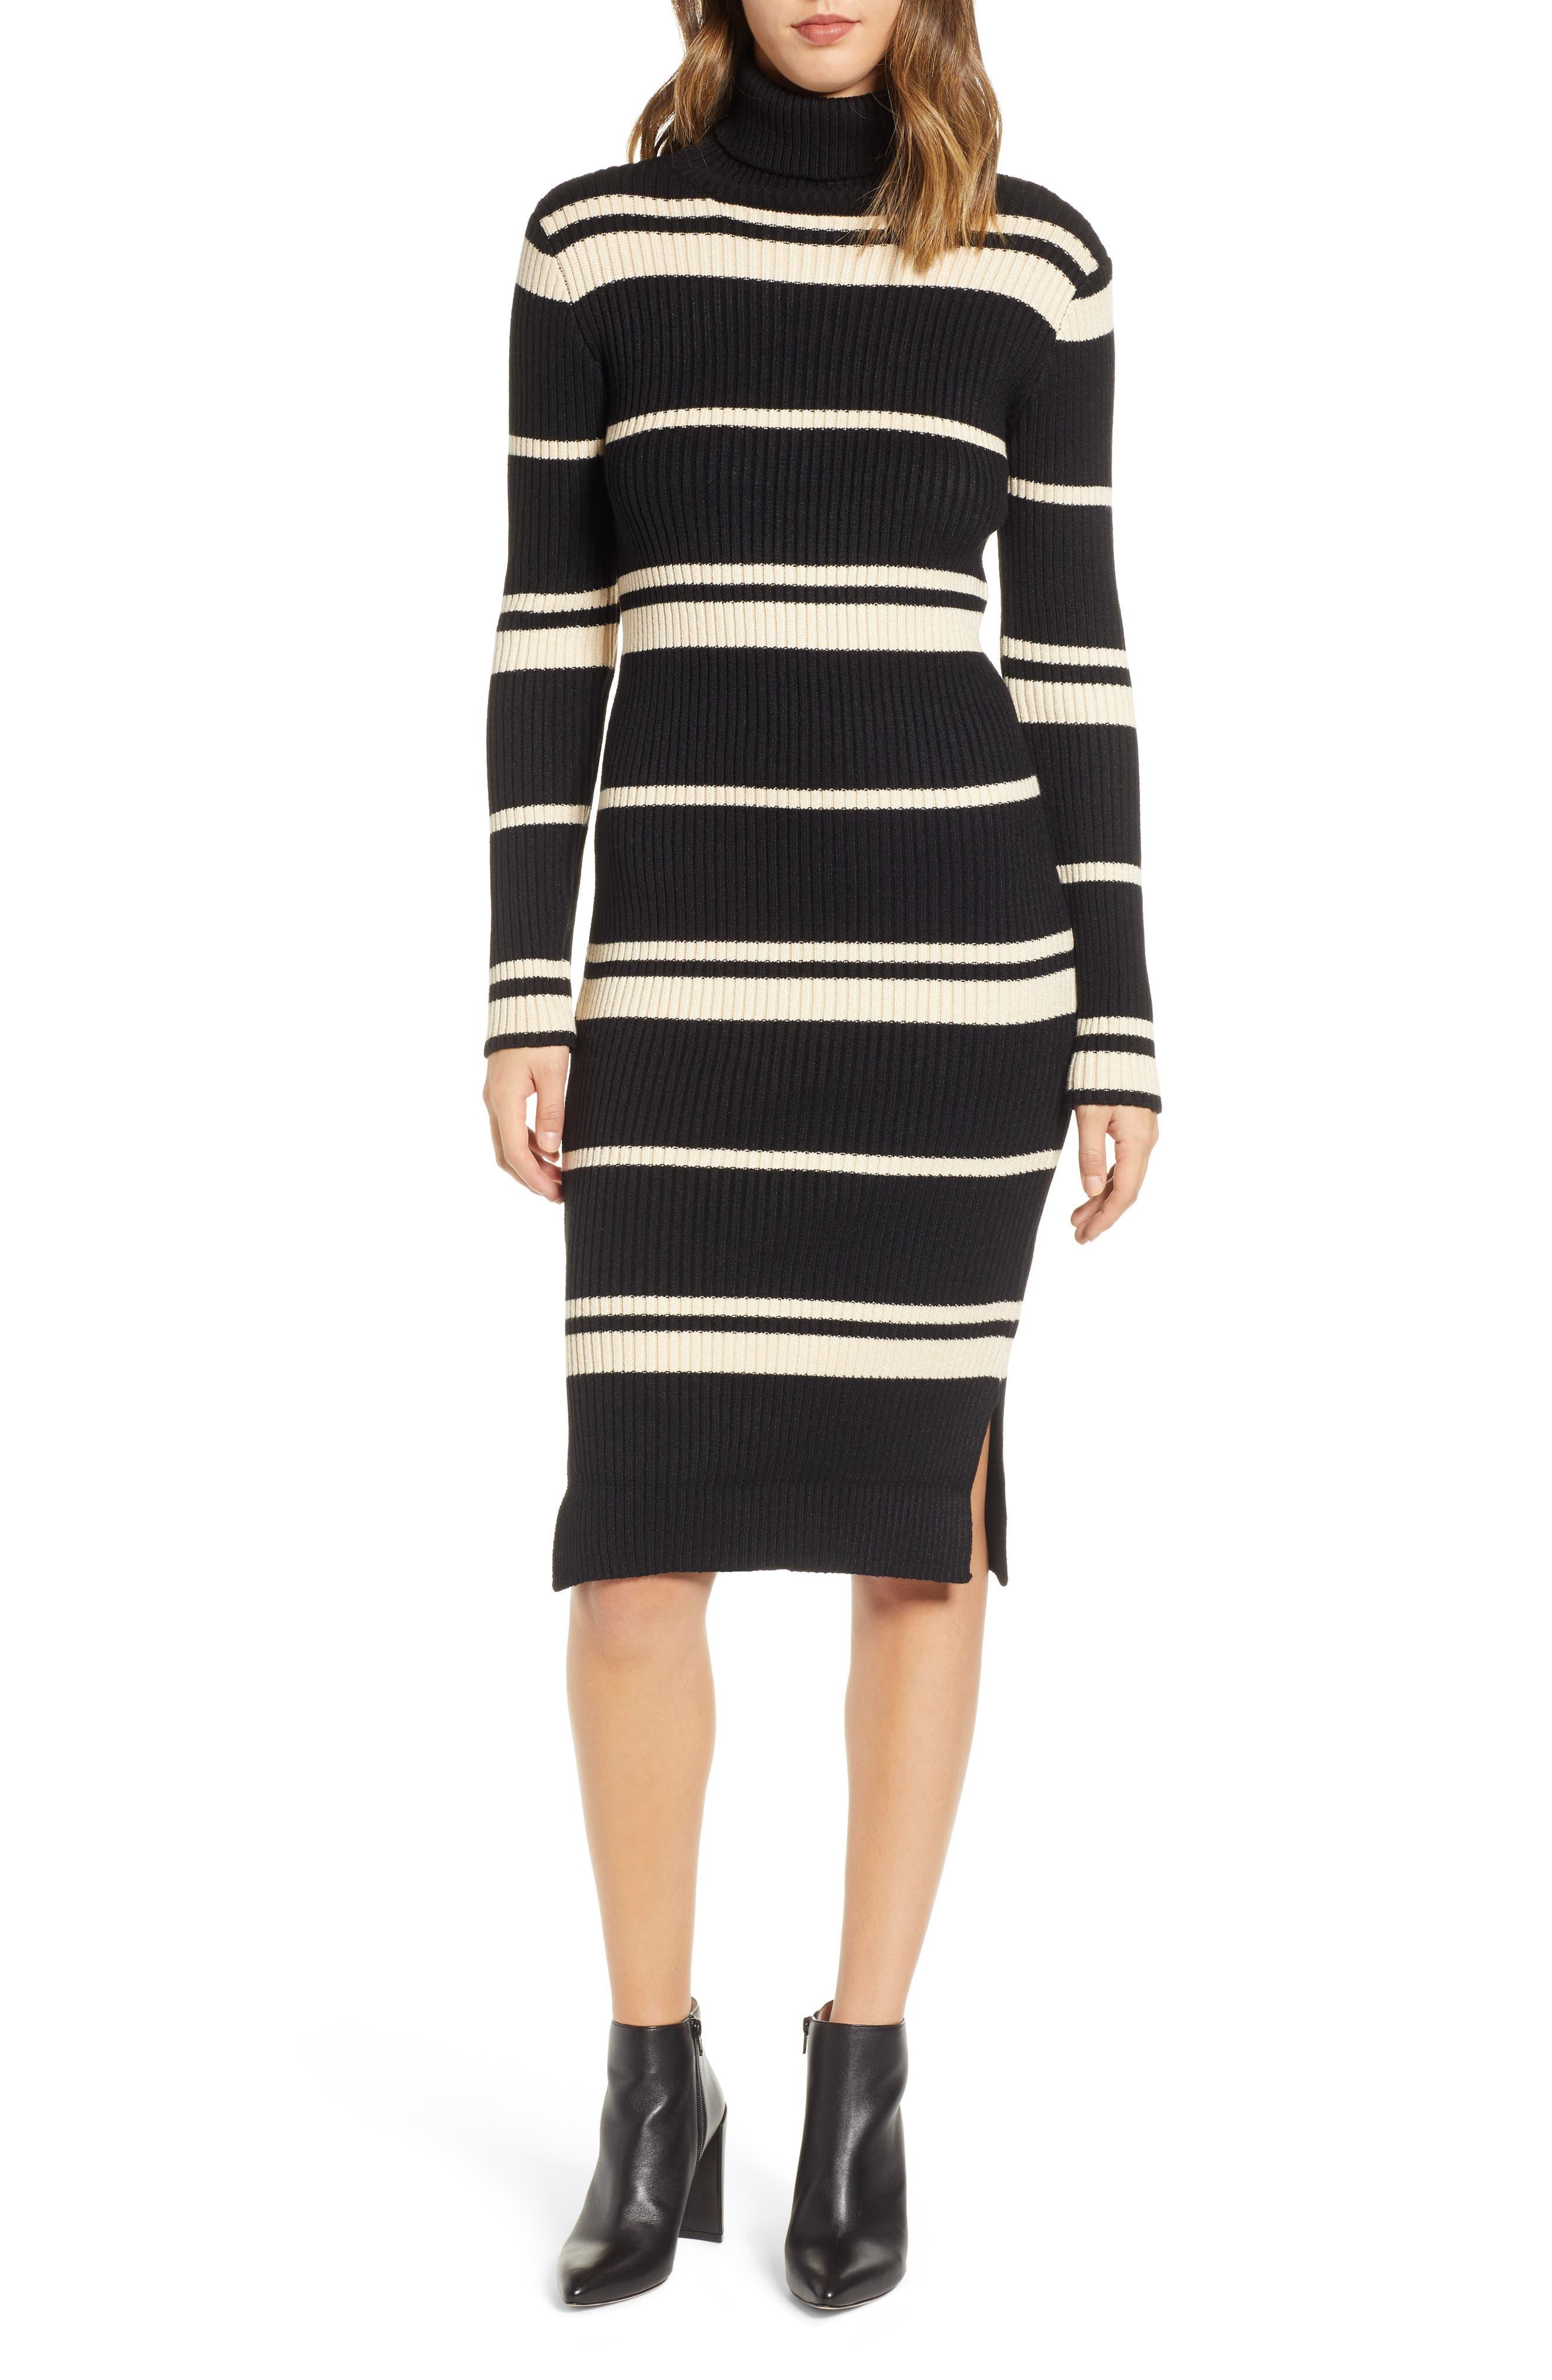 JOA Stripe Turtleneck Dress in Black/ Cream